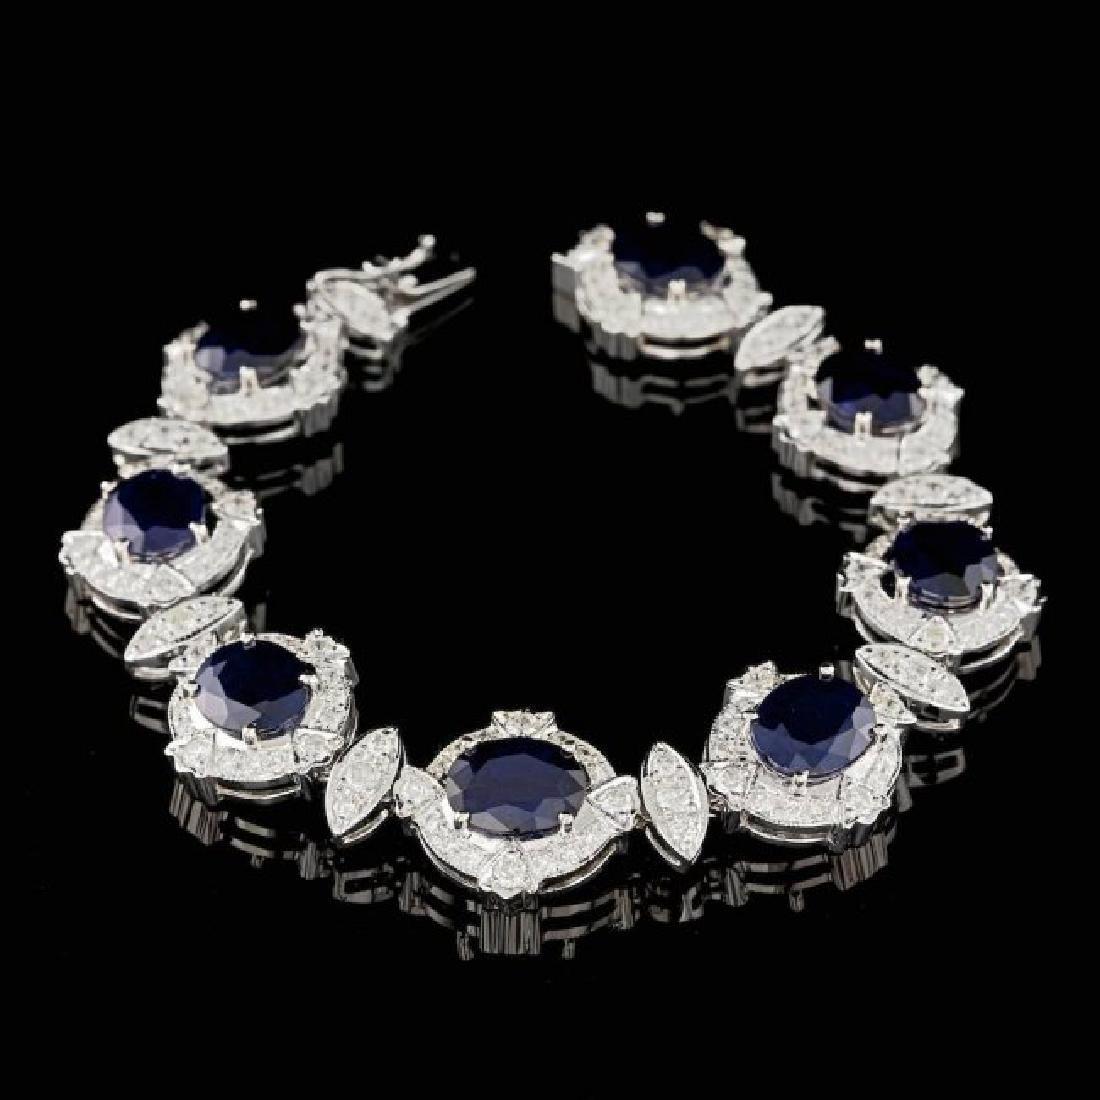 14k Gold 24.50ct Sapphire 5.50ct Diamond Bracelet - 3